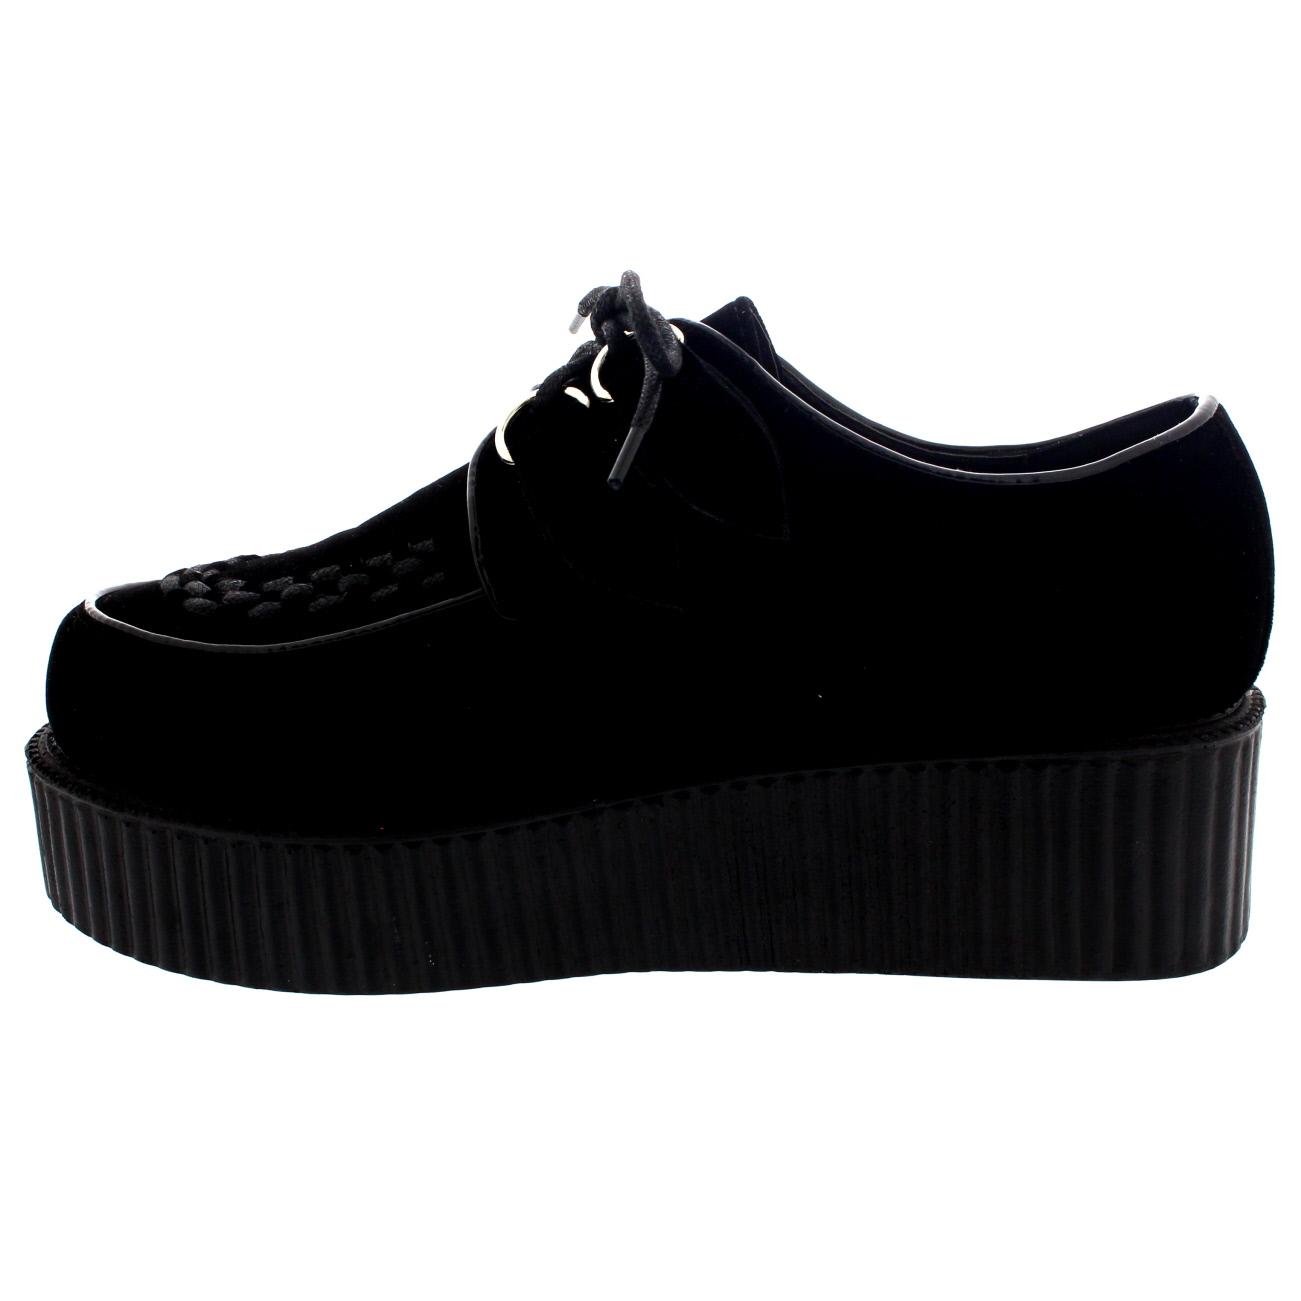 22ae11d7e142 Womens Double Platform Retro Punk Festival Rock Brothel Creepers Shoes UK 3- 9